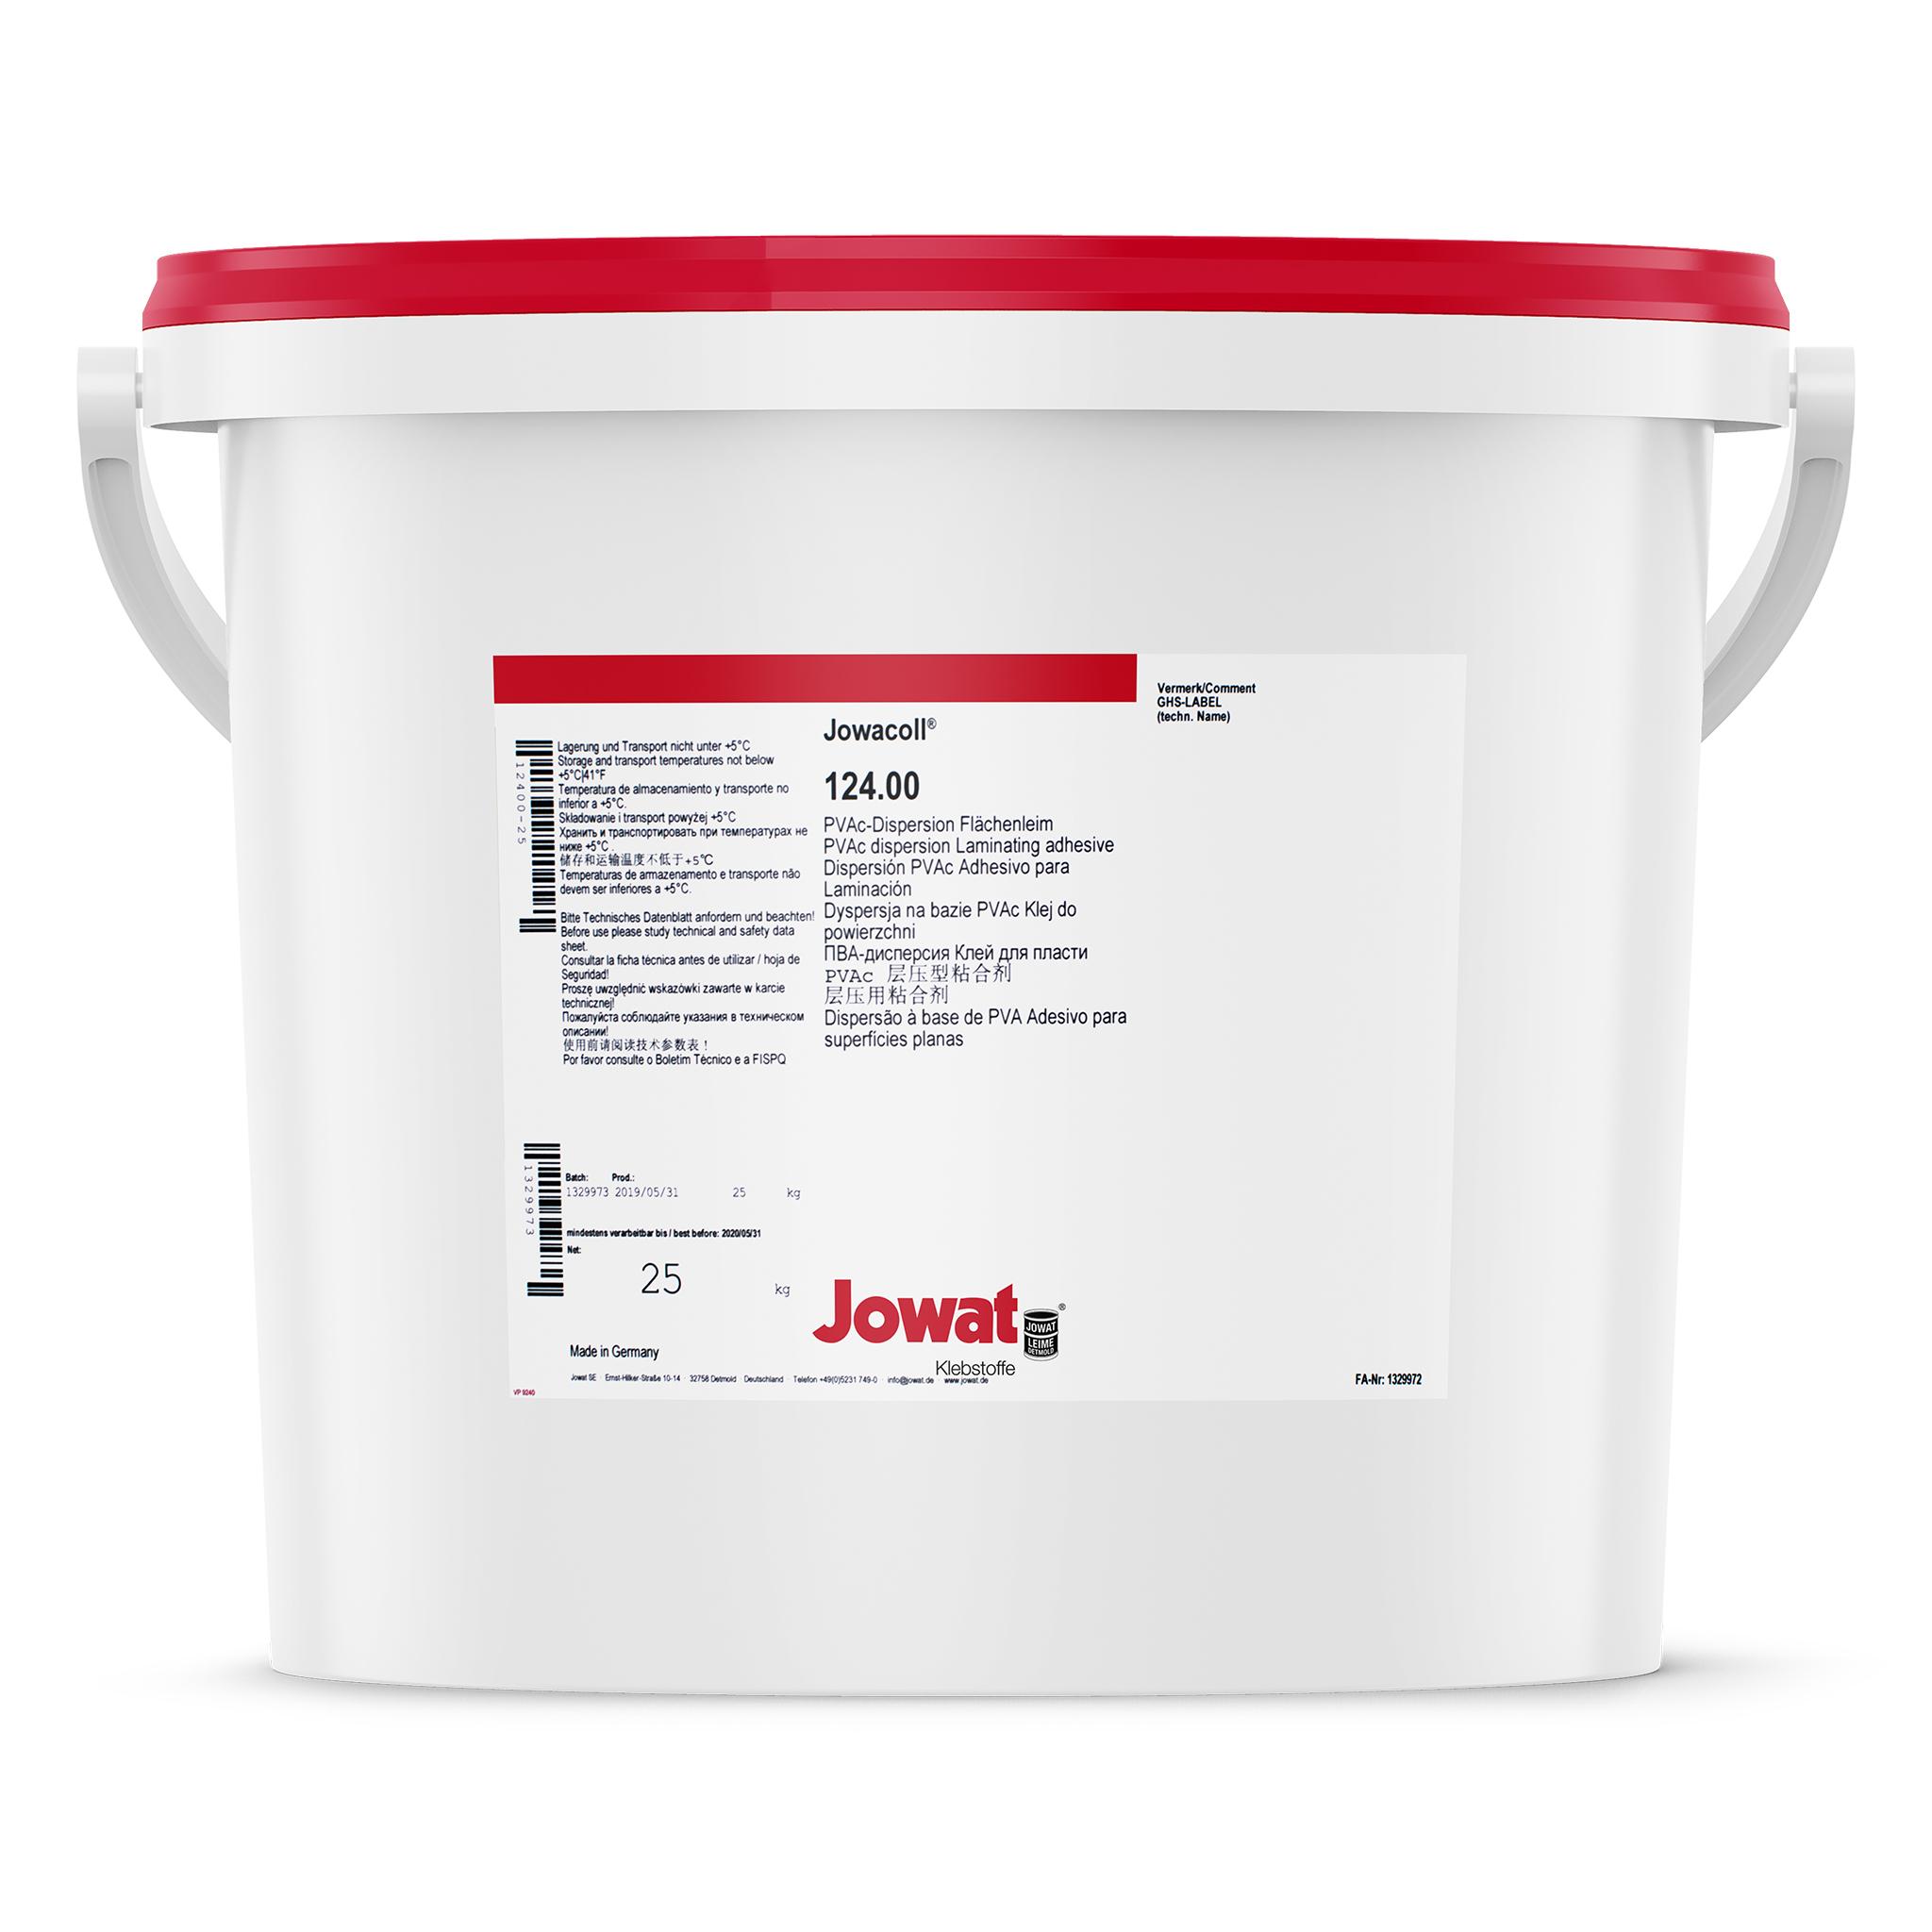 JOWACOLL 124.00 - PVAc Dispersive Adhesive